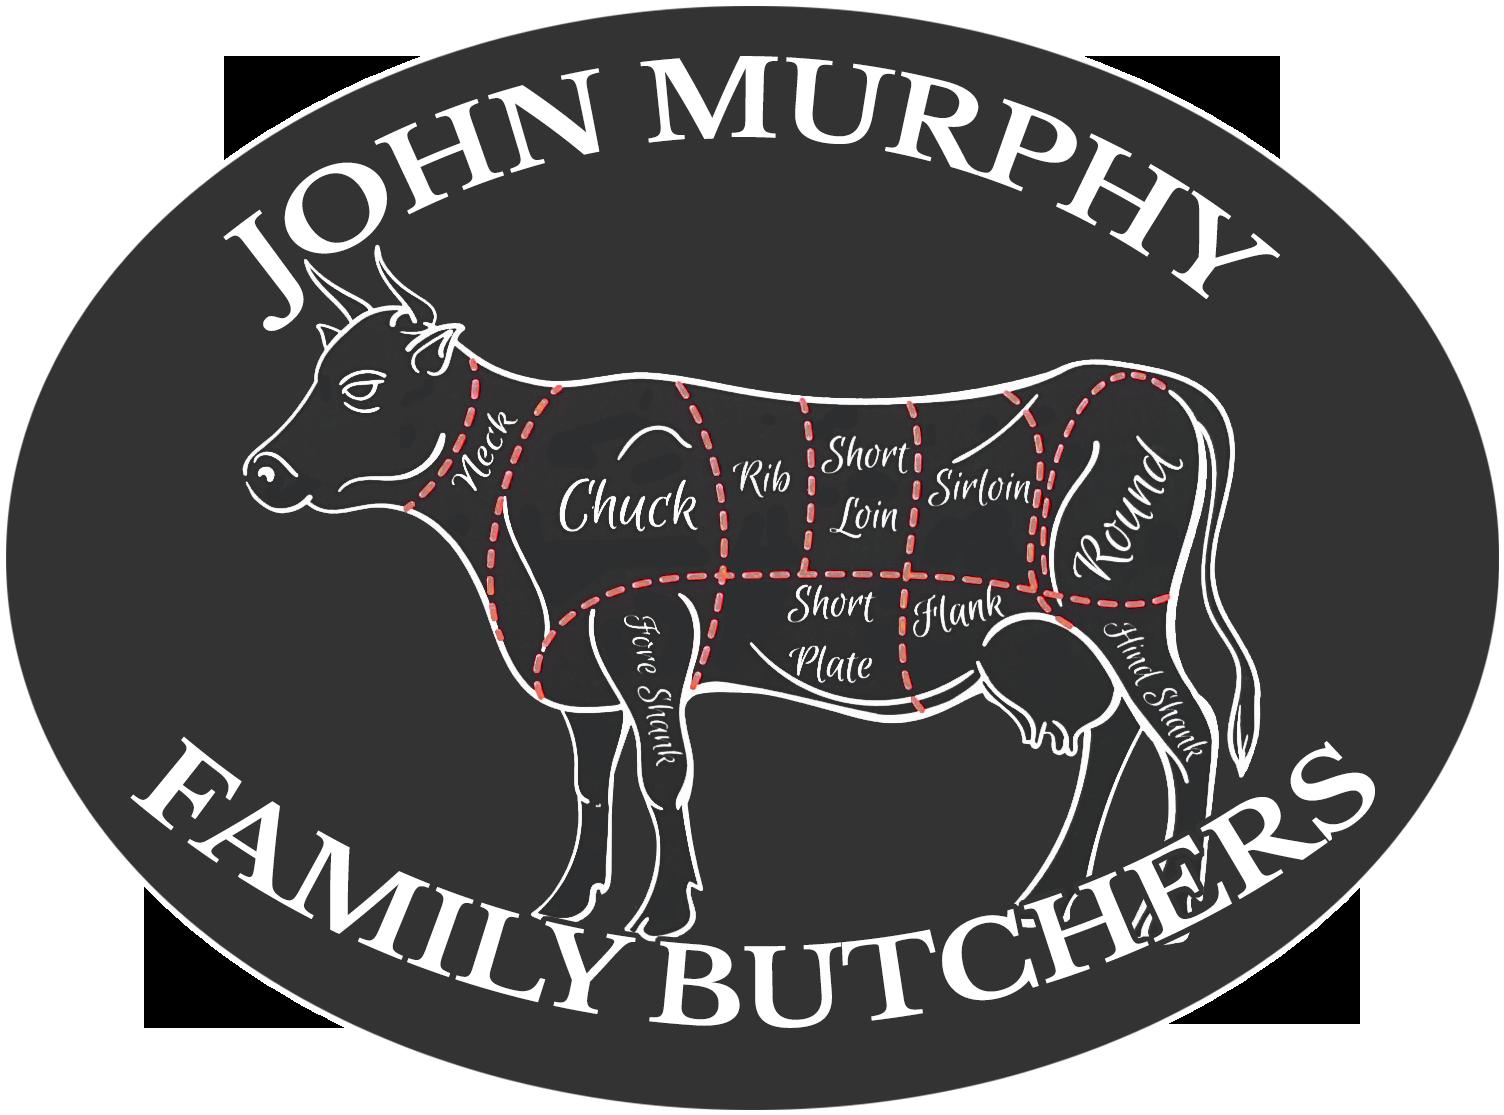 John Murphy Family Butcher logo